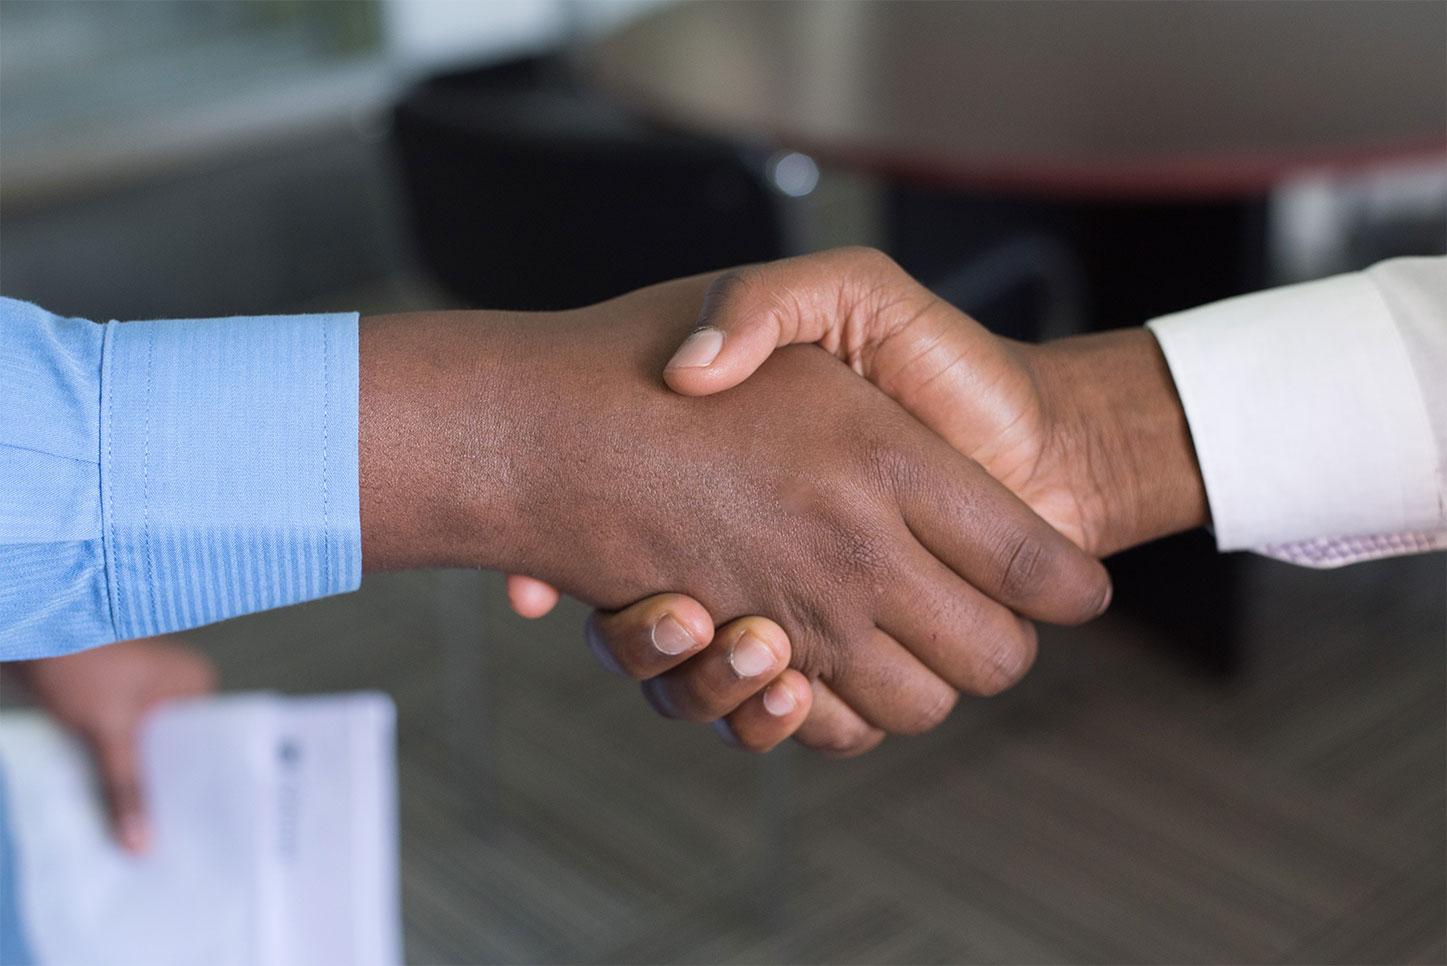 Handshake between two people.